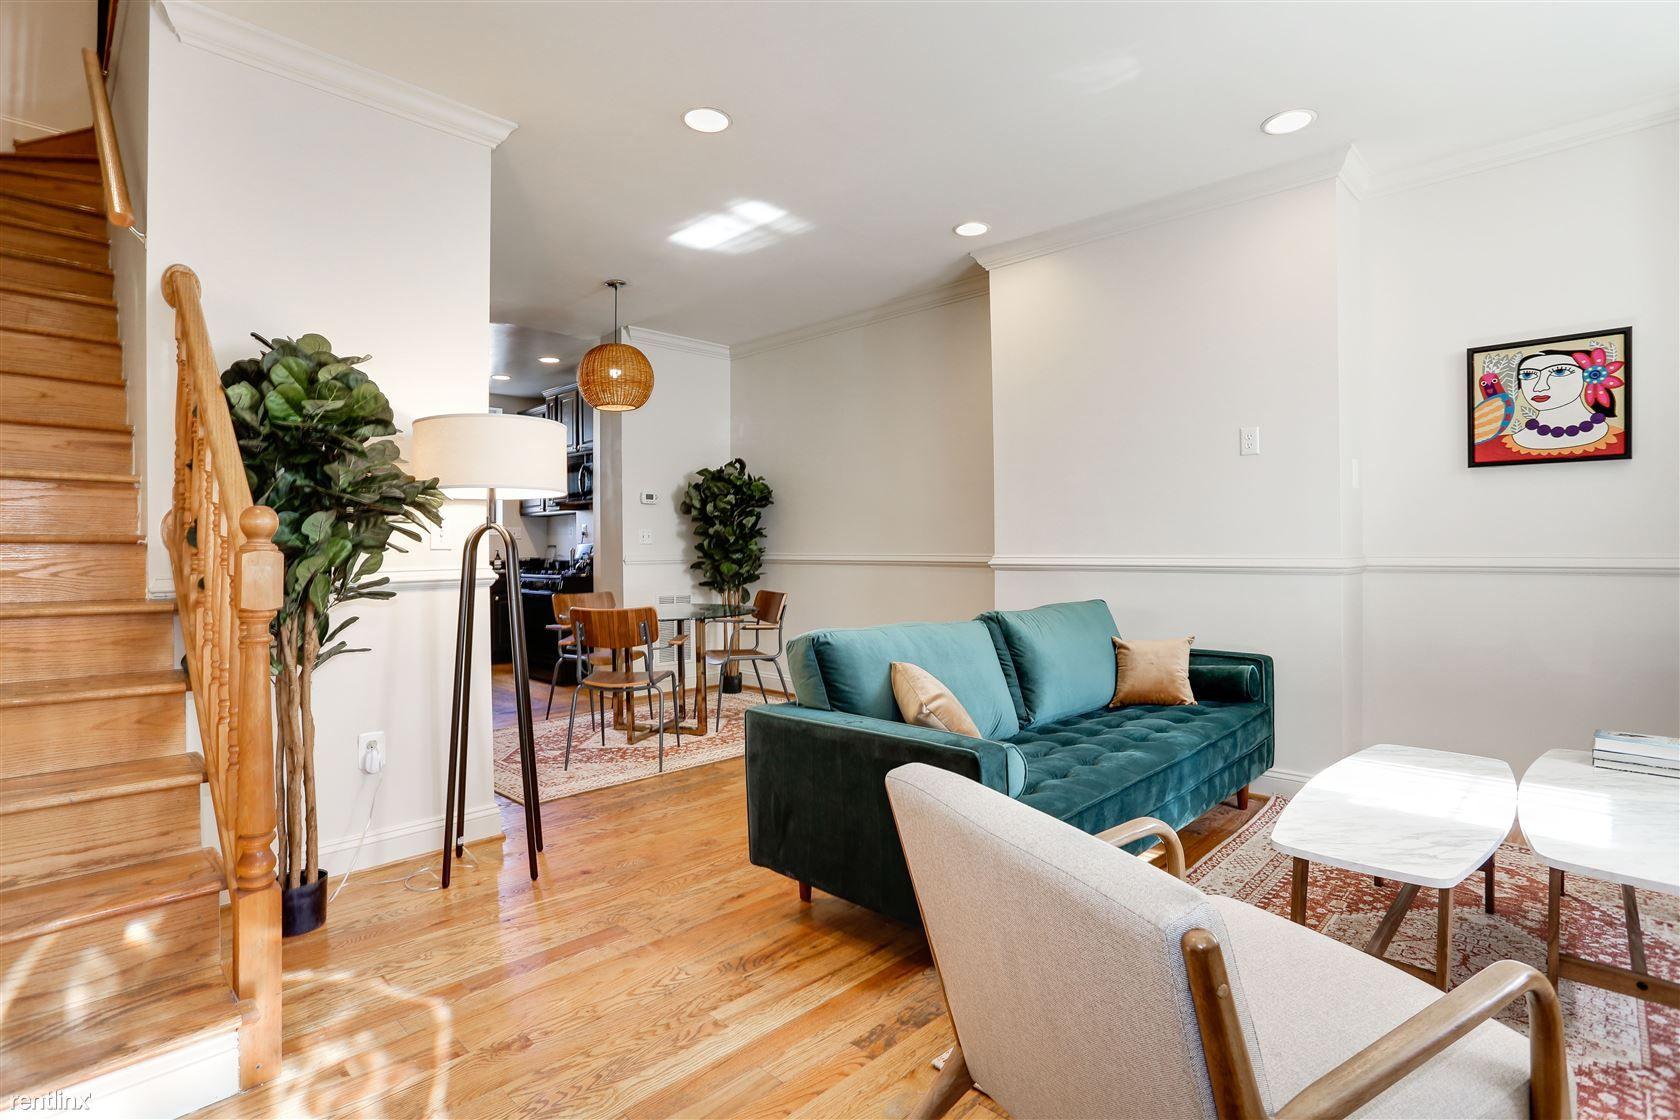 1727 New Jersey Ave NW, Washington DC, DC, 20001 rental